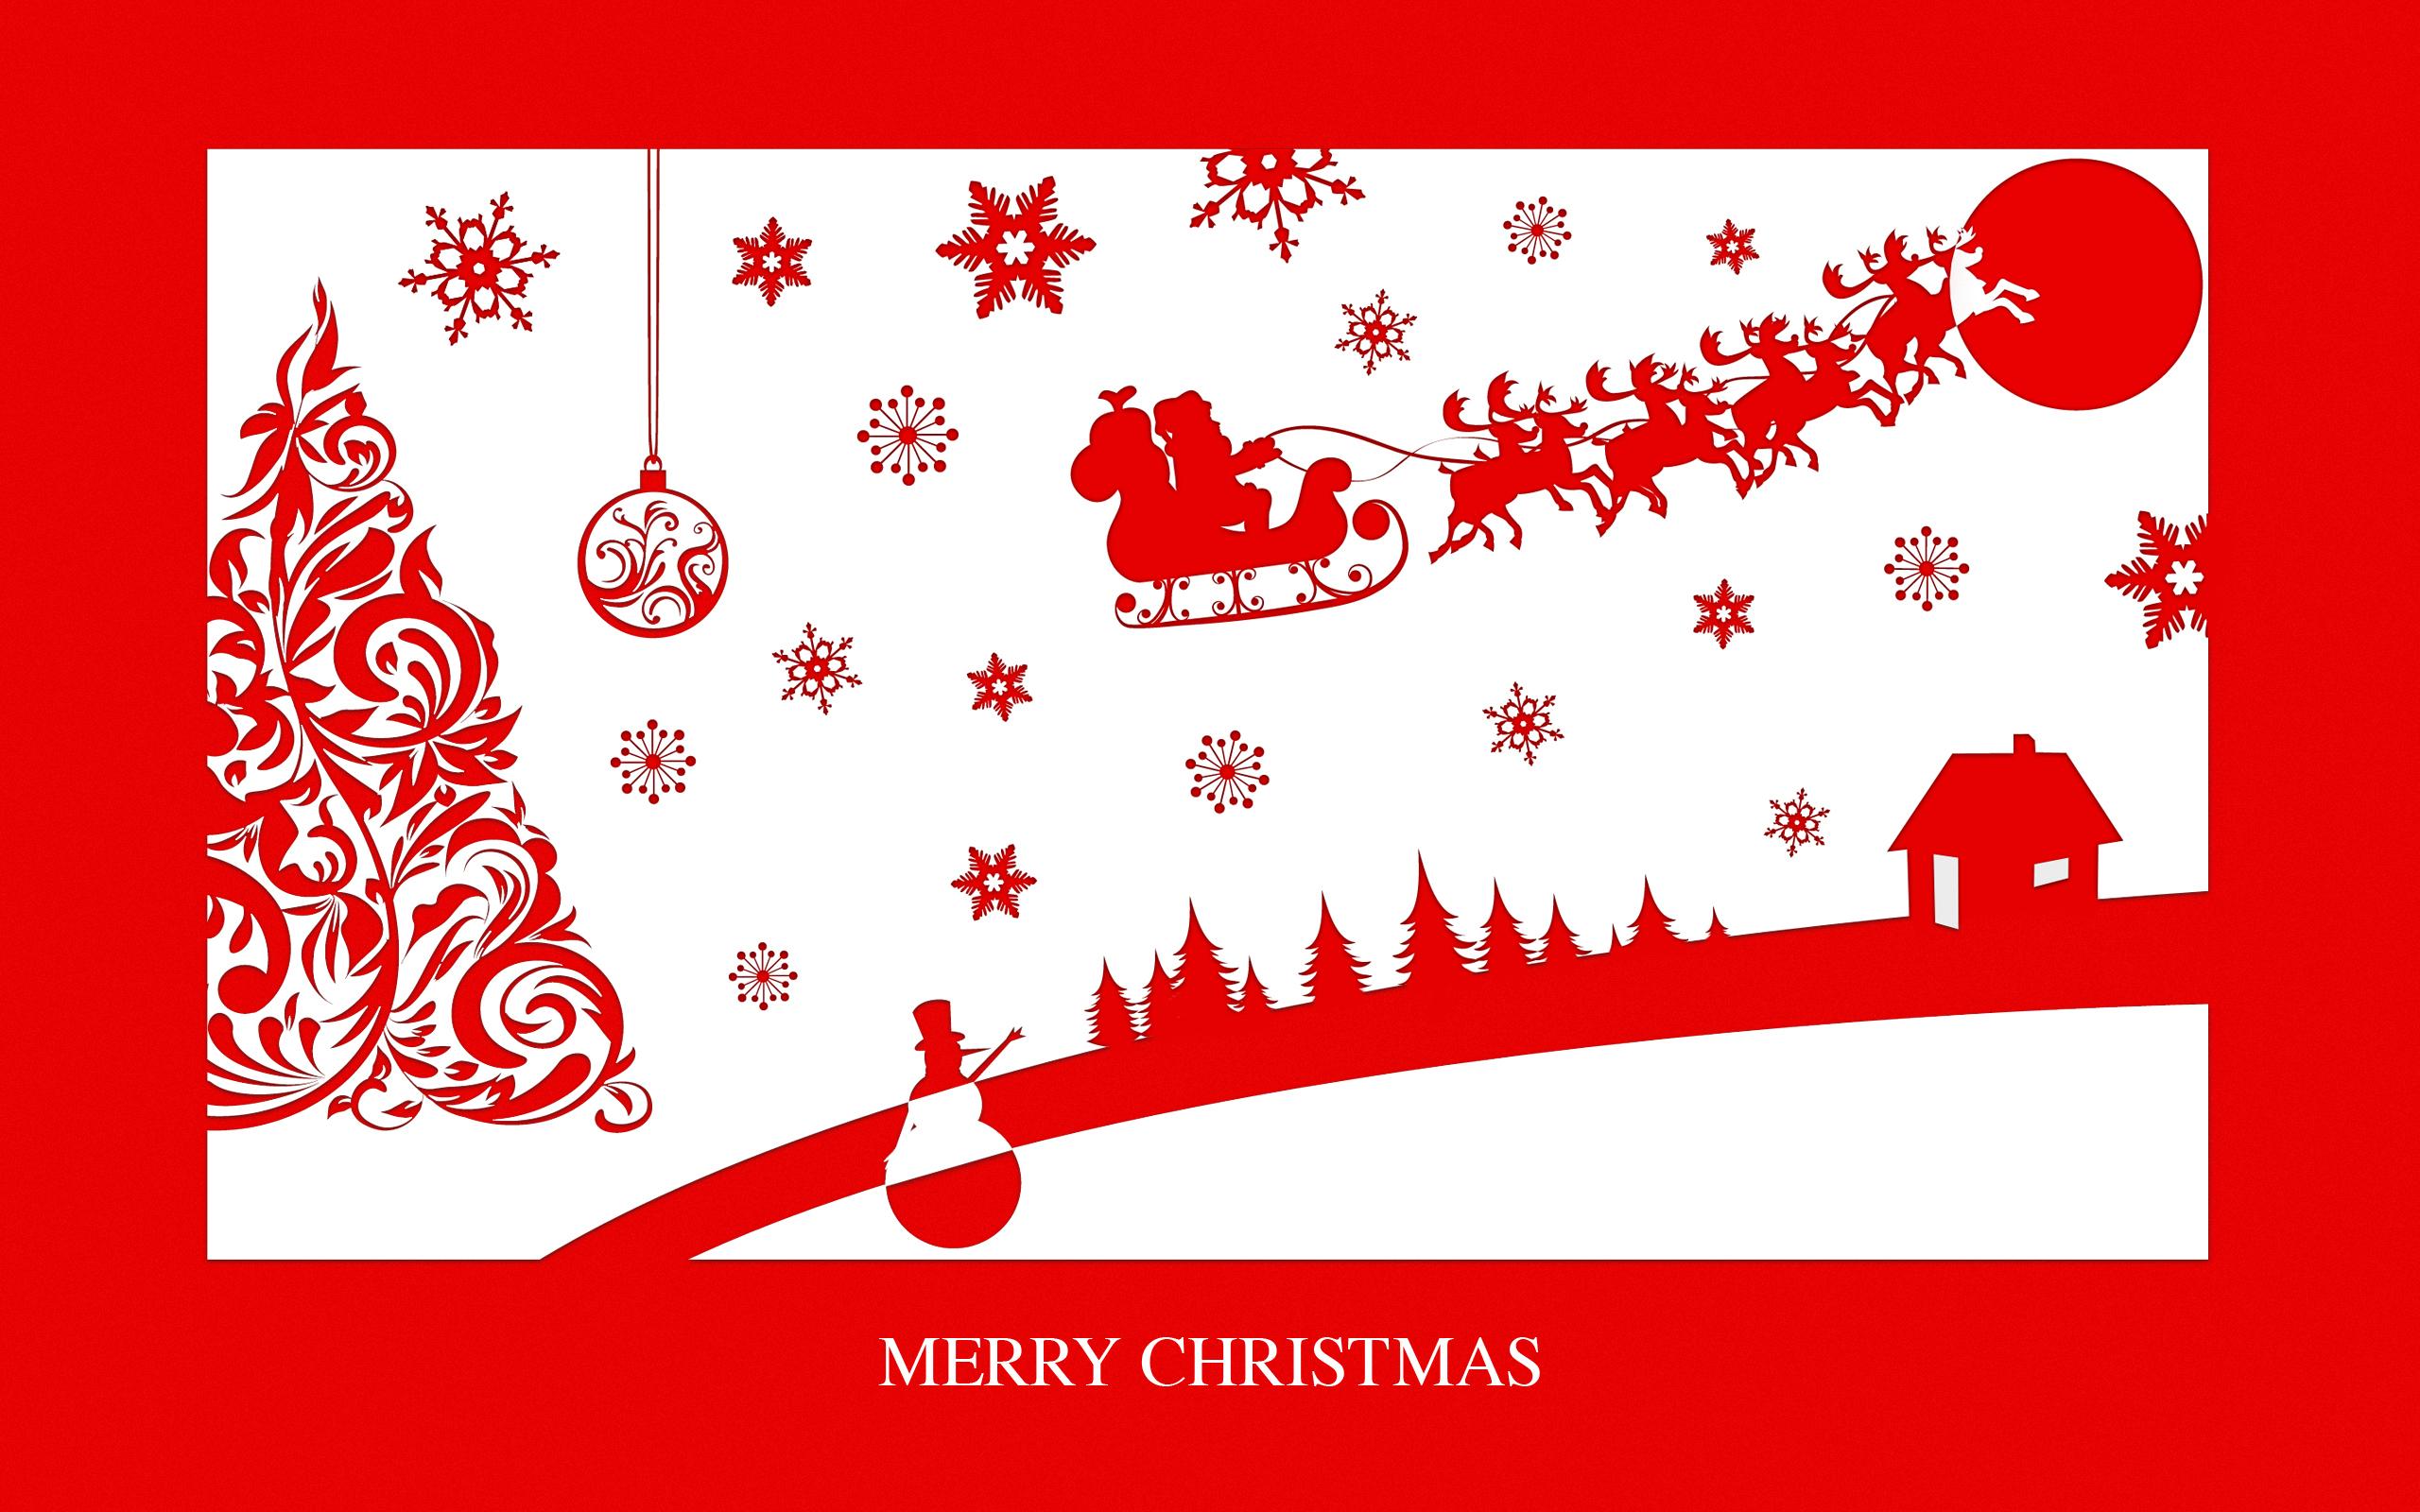 Merry Christmas, Clipart